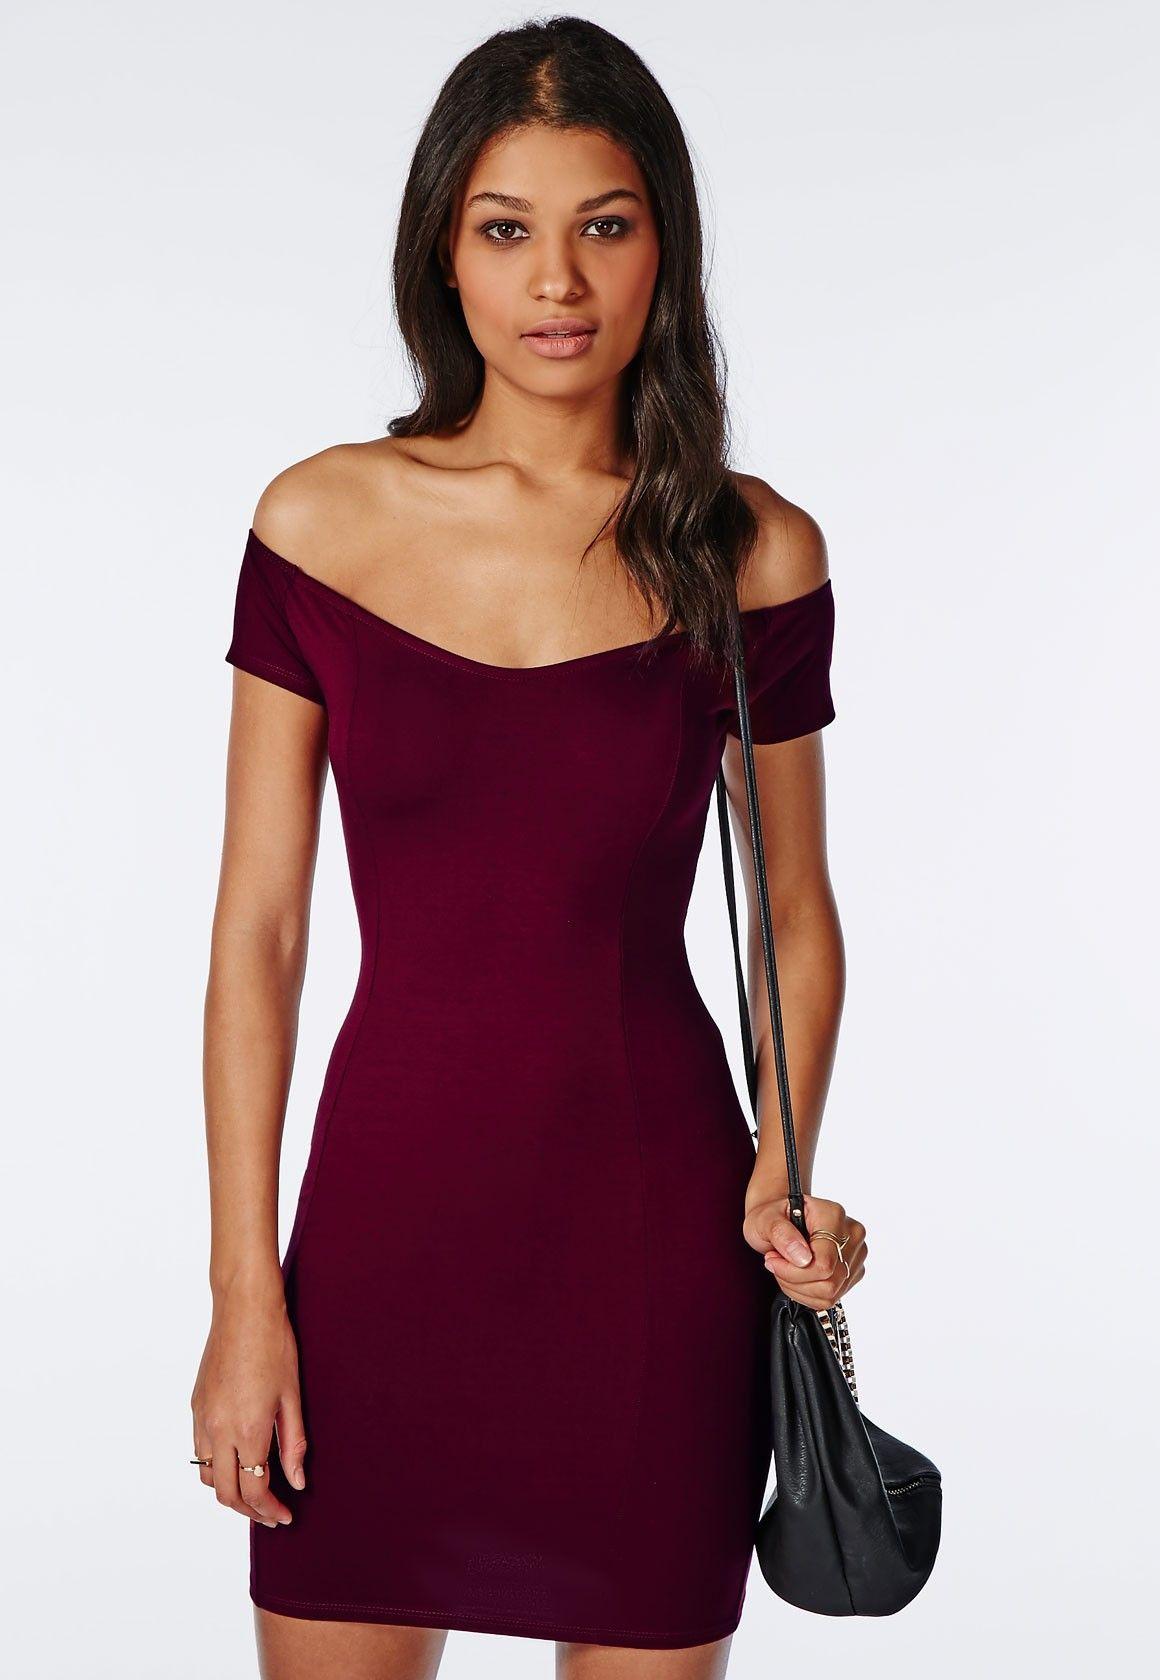 Jersey Bardot Bodycon Dress Burgundy - Dresses - Bodycon Dresses ...